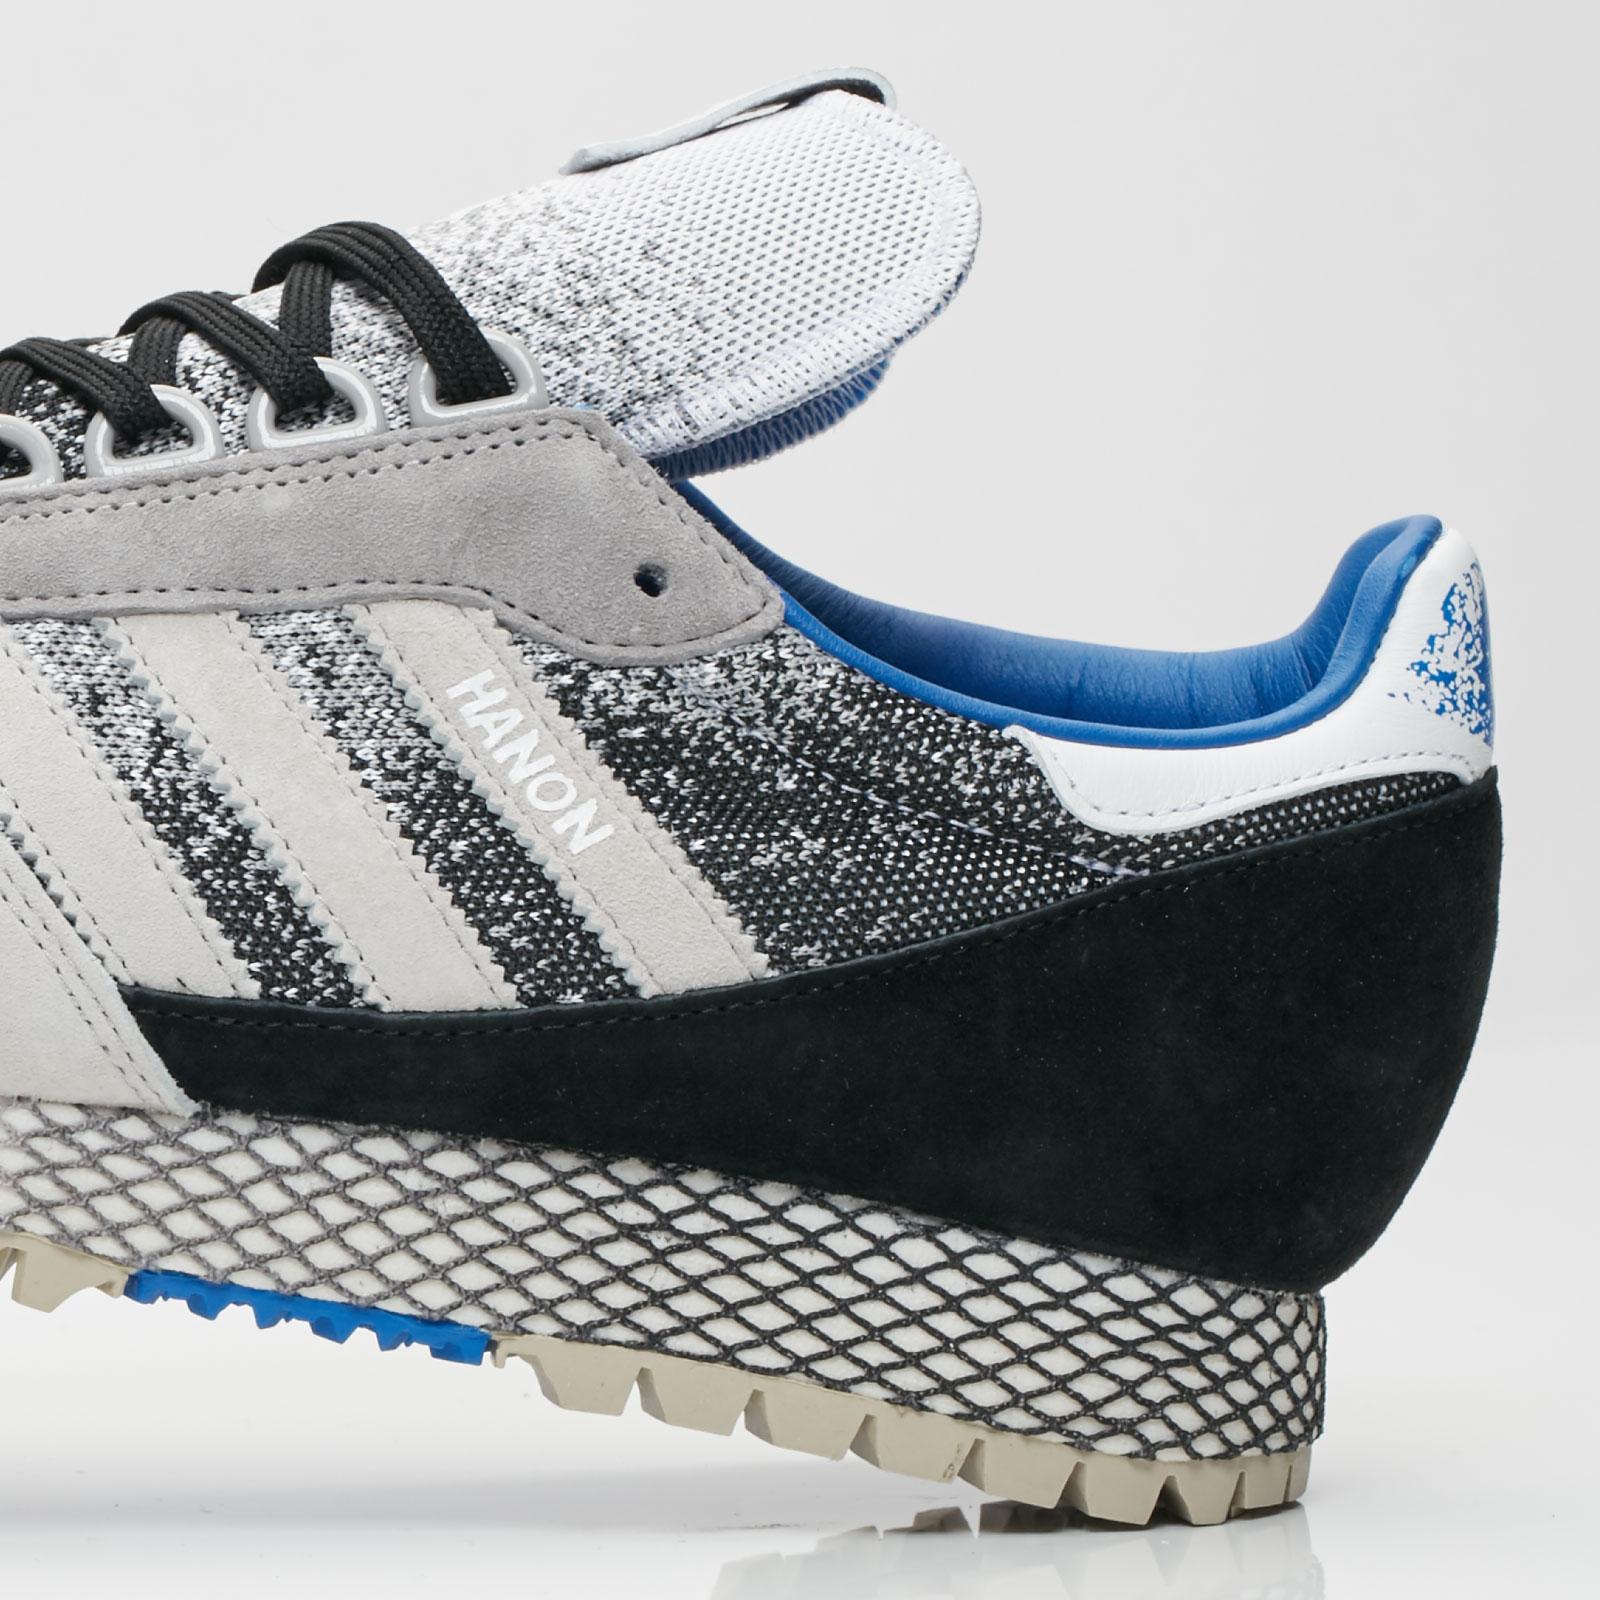 Adidas New York X Hanon Cm7878 Sneakersnstuff